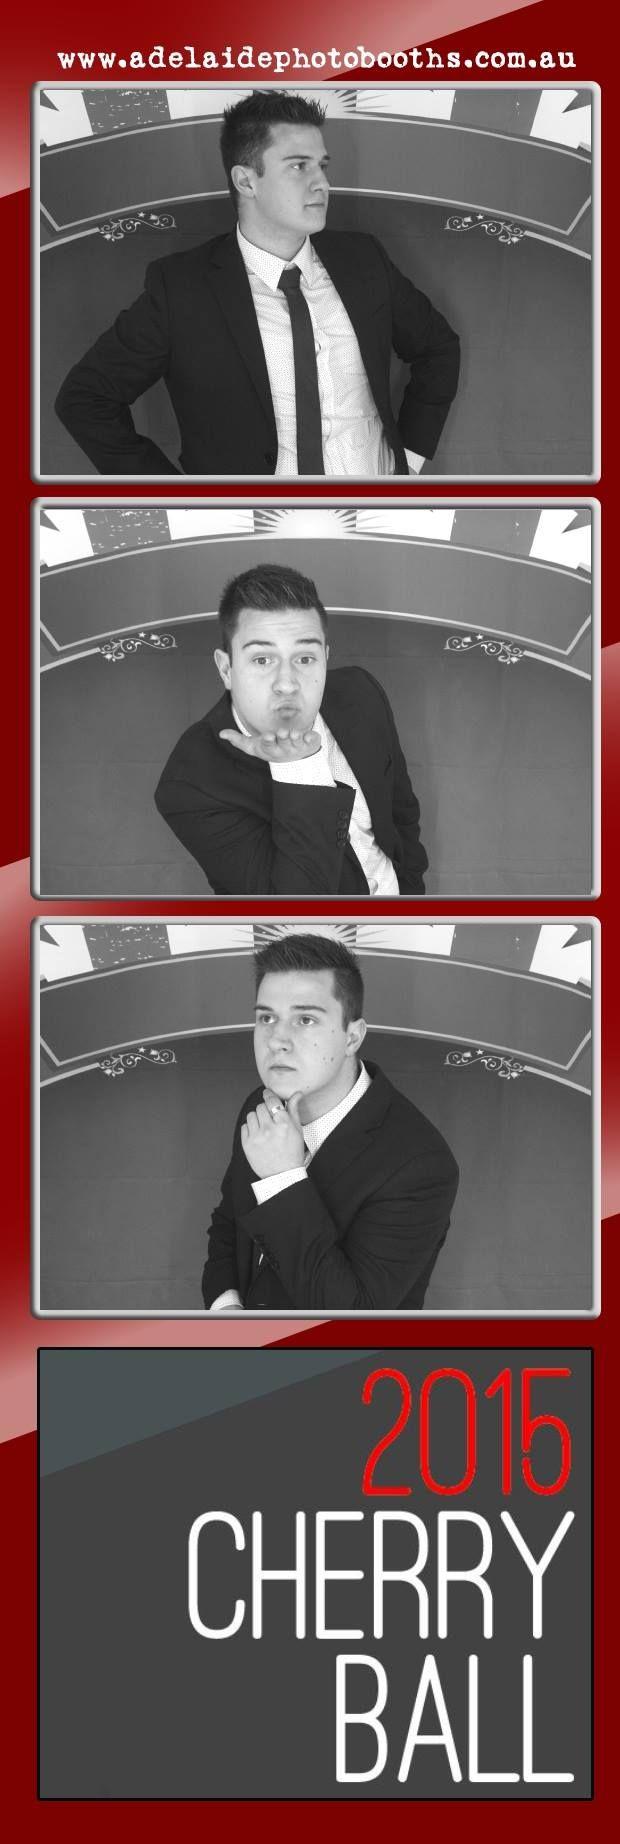 #cherryball2015 #adelaidephotobooths #photoboothsadelaide #ohsnap #toocoolforschool